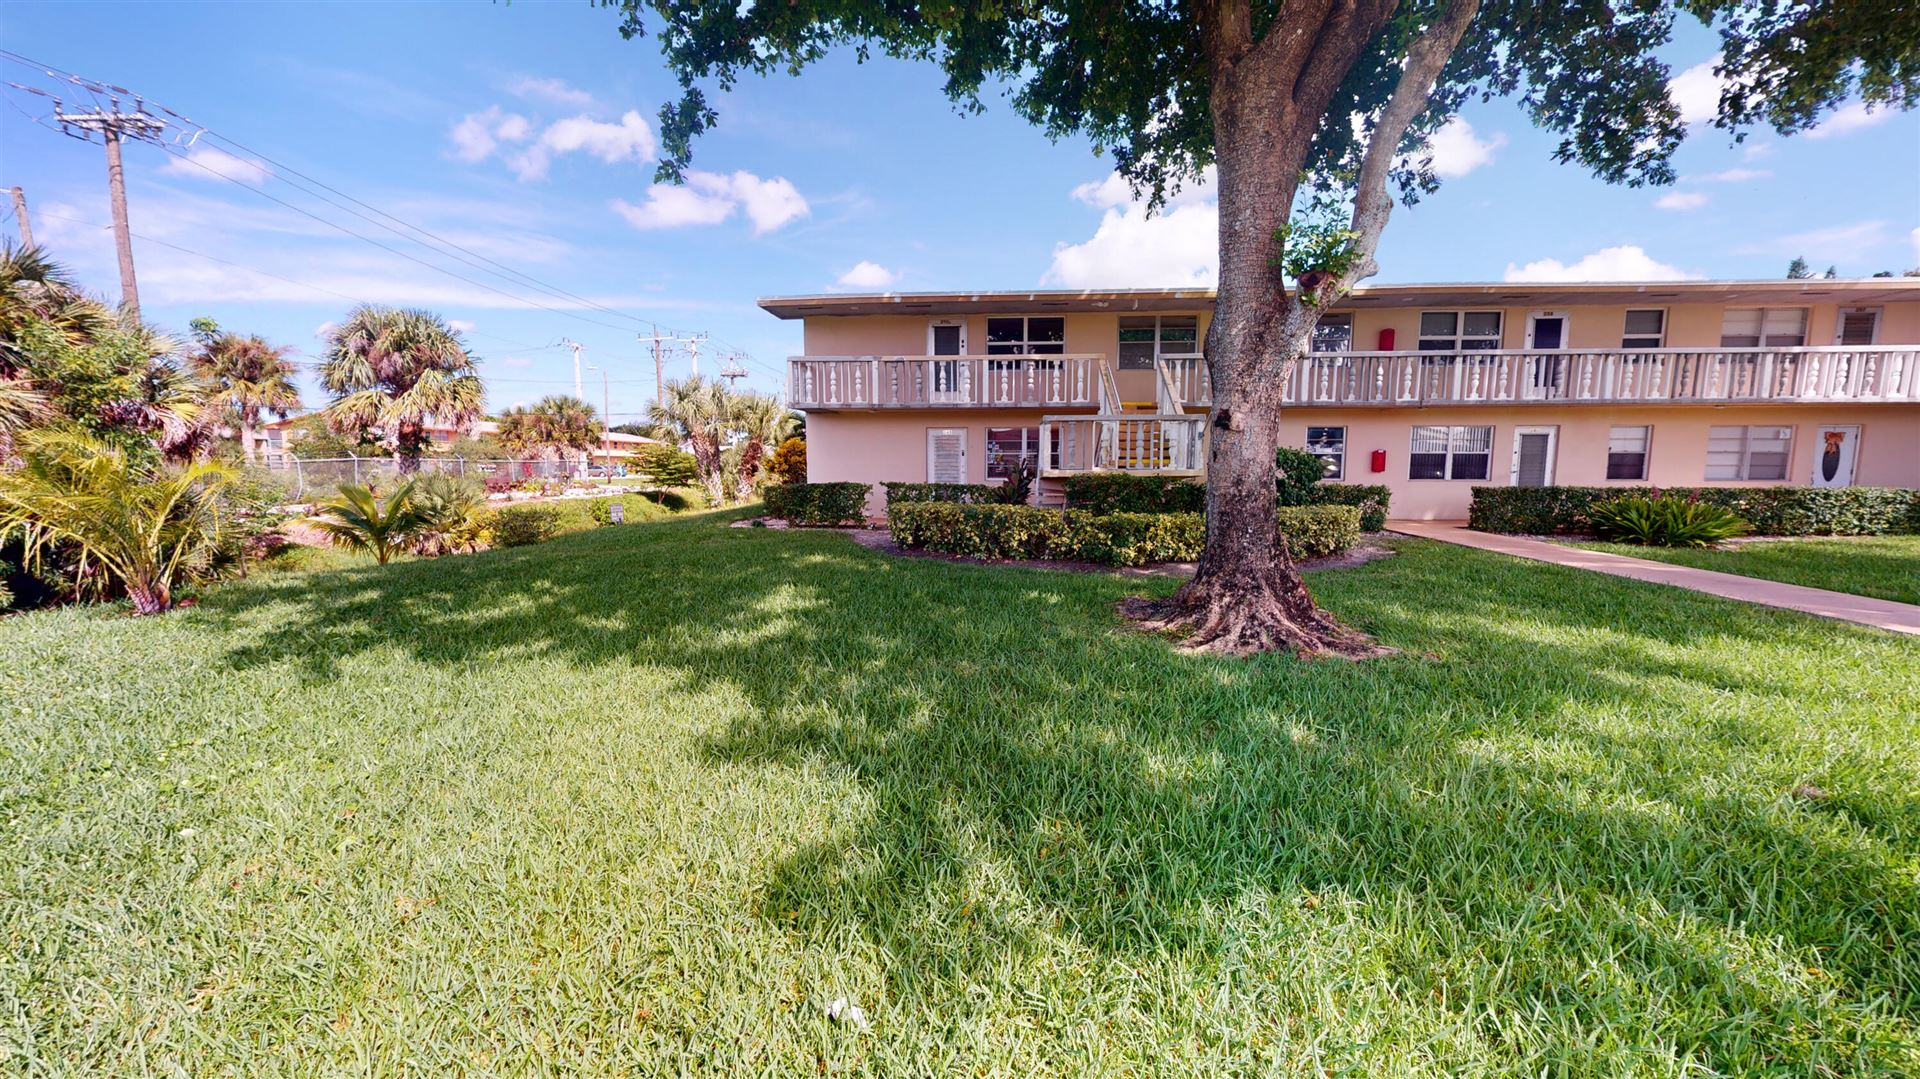 260 Dorchester K, West Palm Beach, FL 33417 - MLS#: RX-10750124